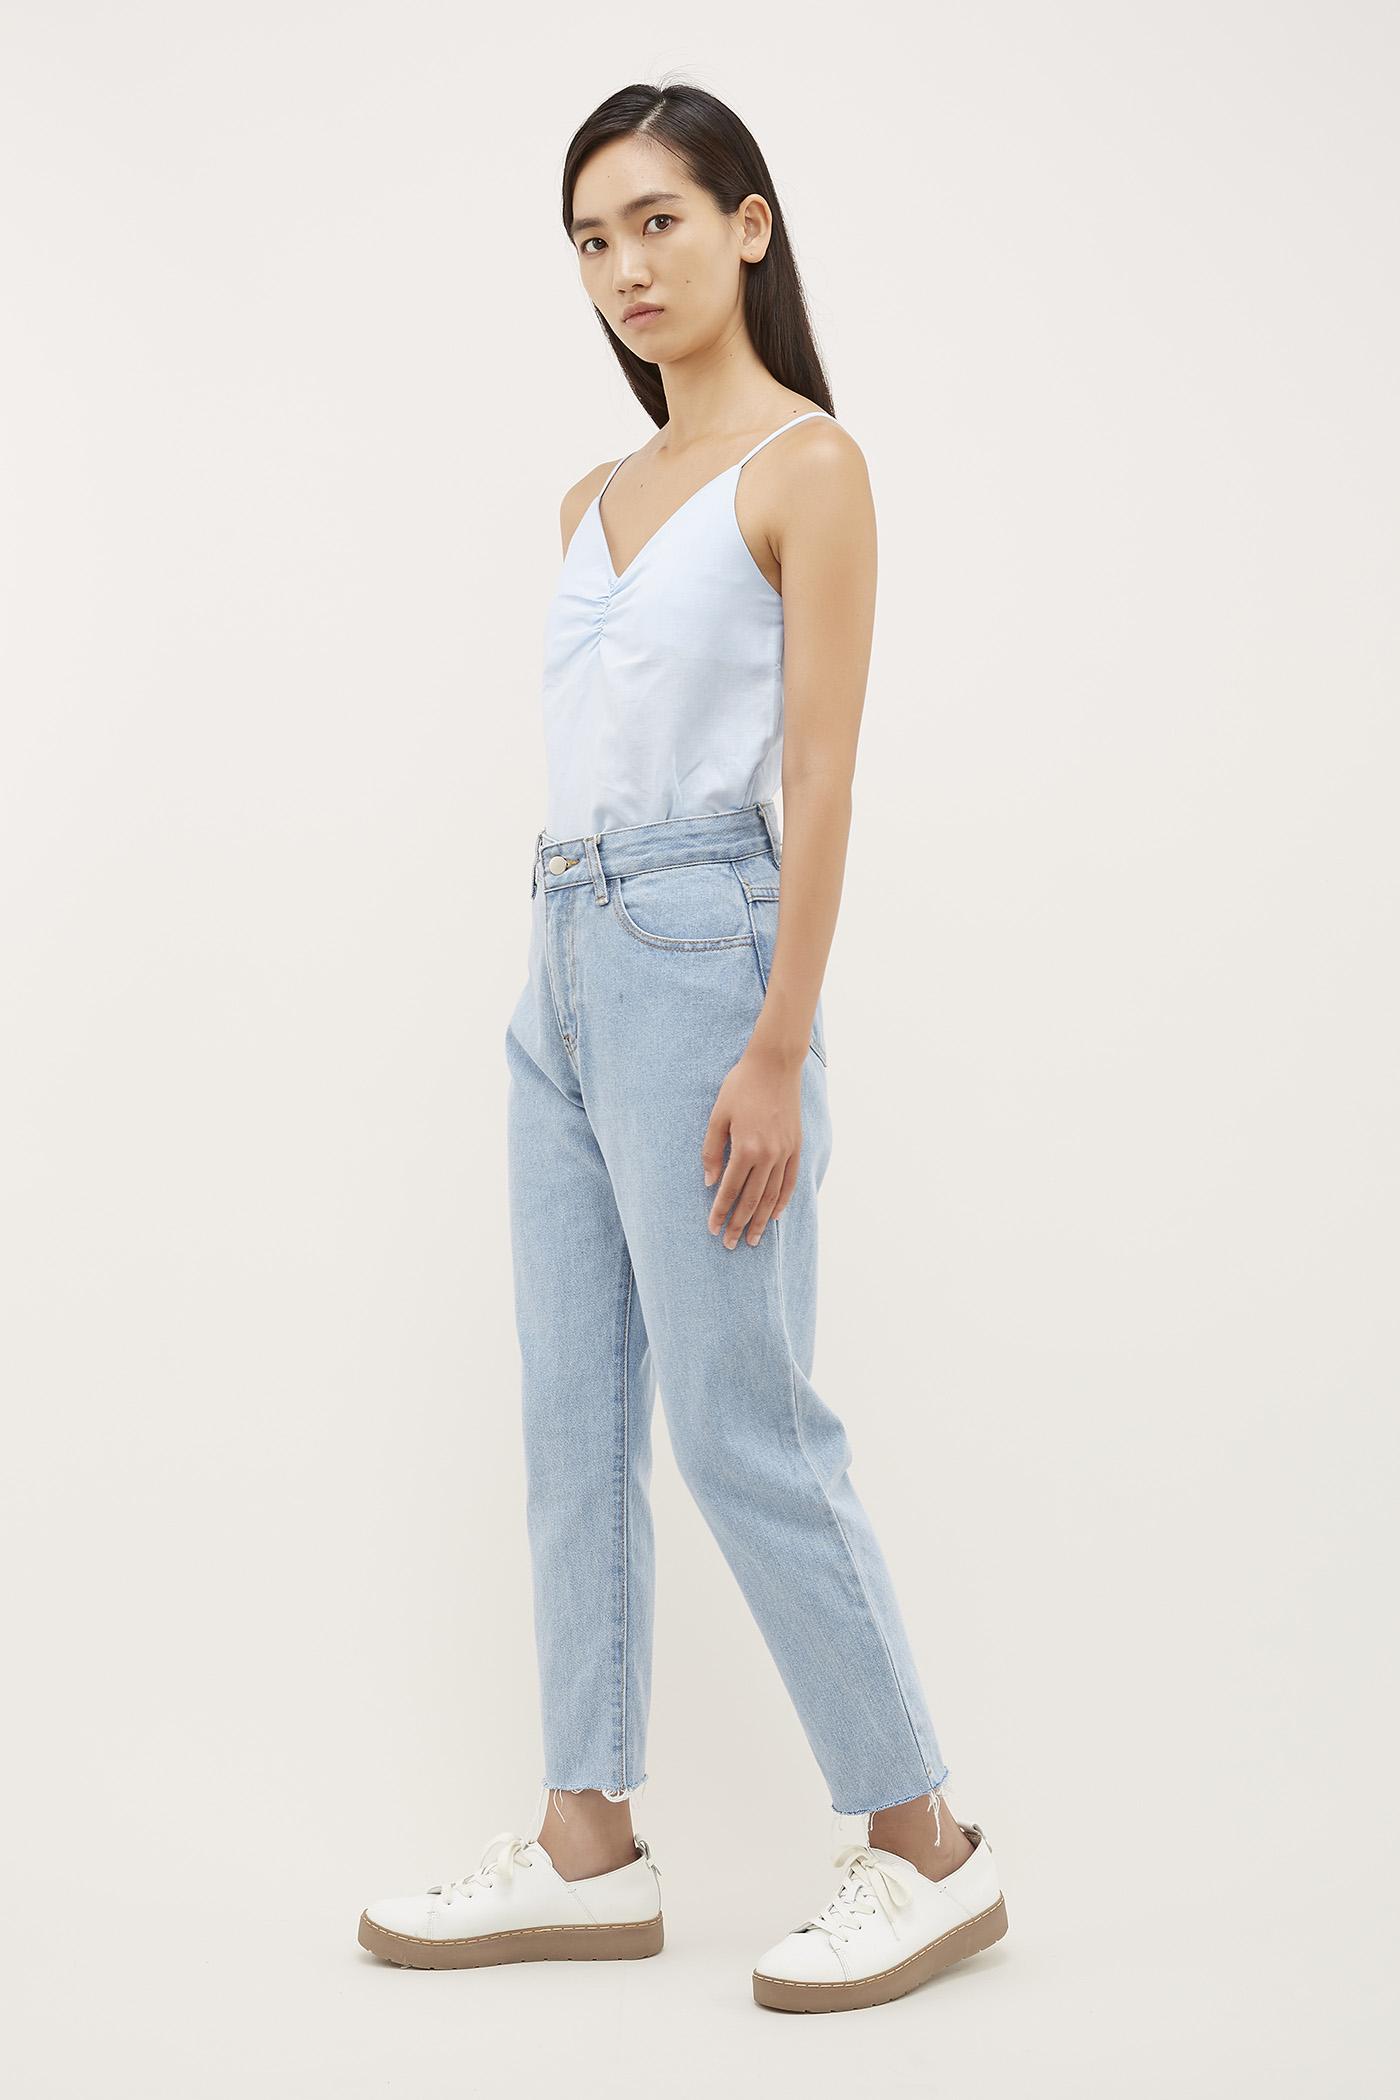 Kiiara Frayed-Hem Jeans